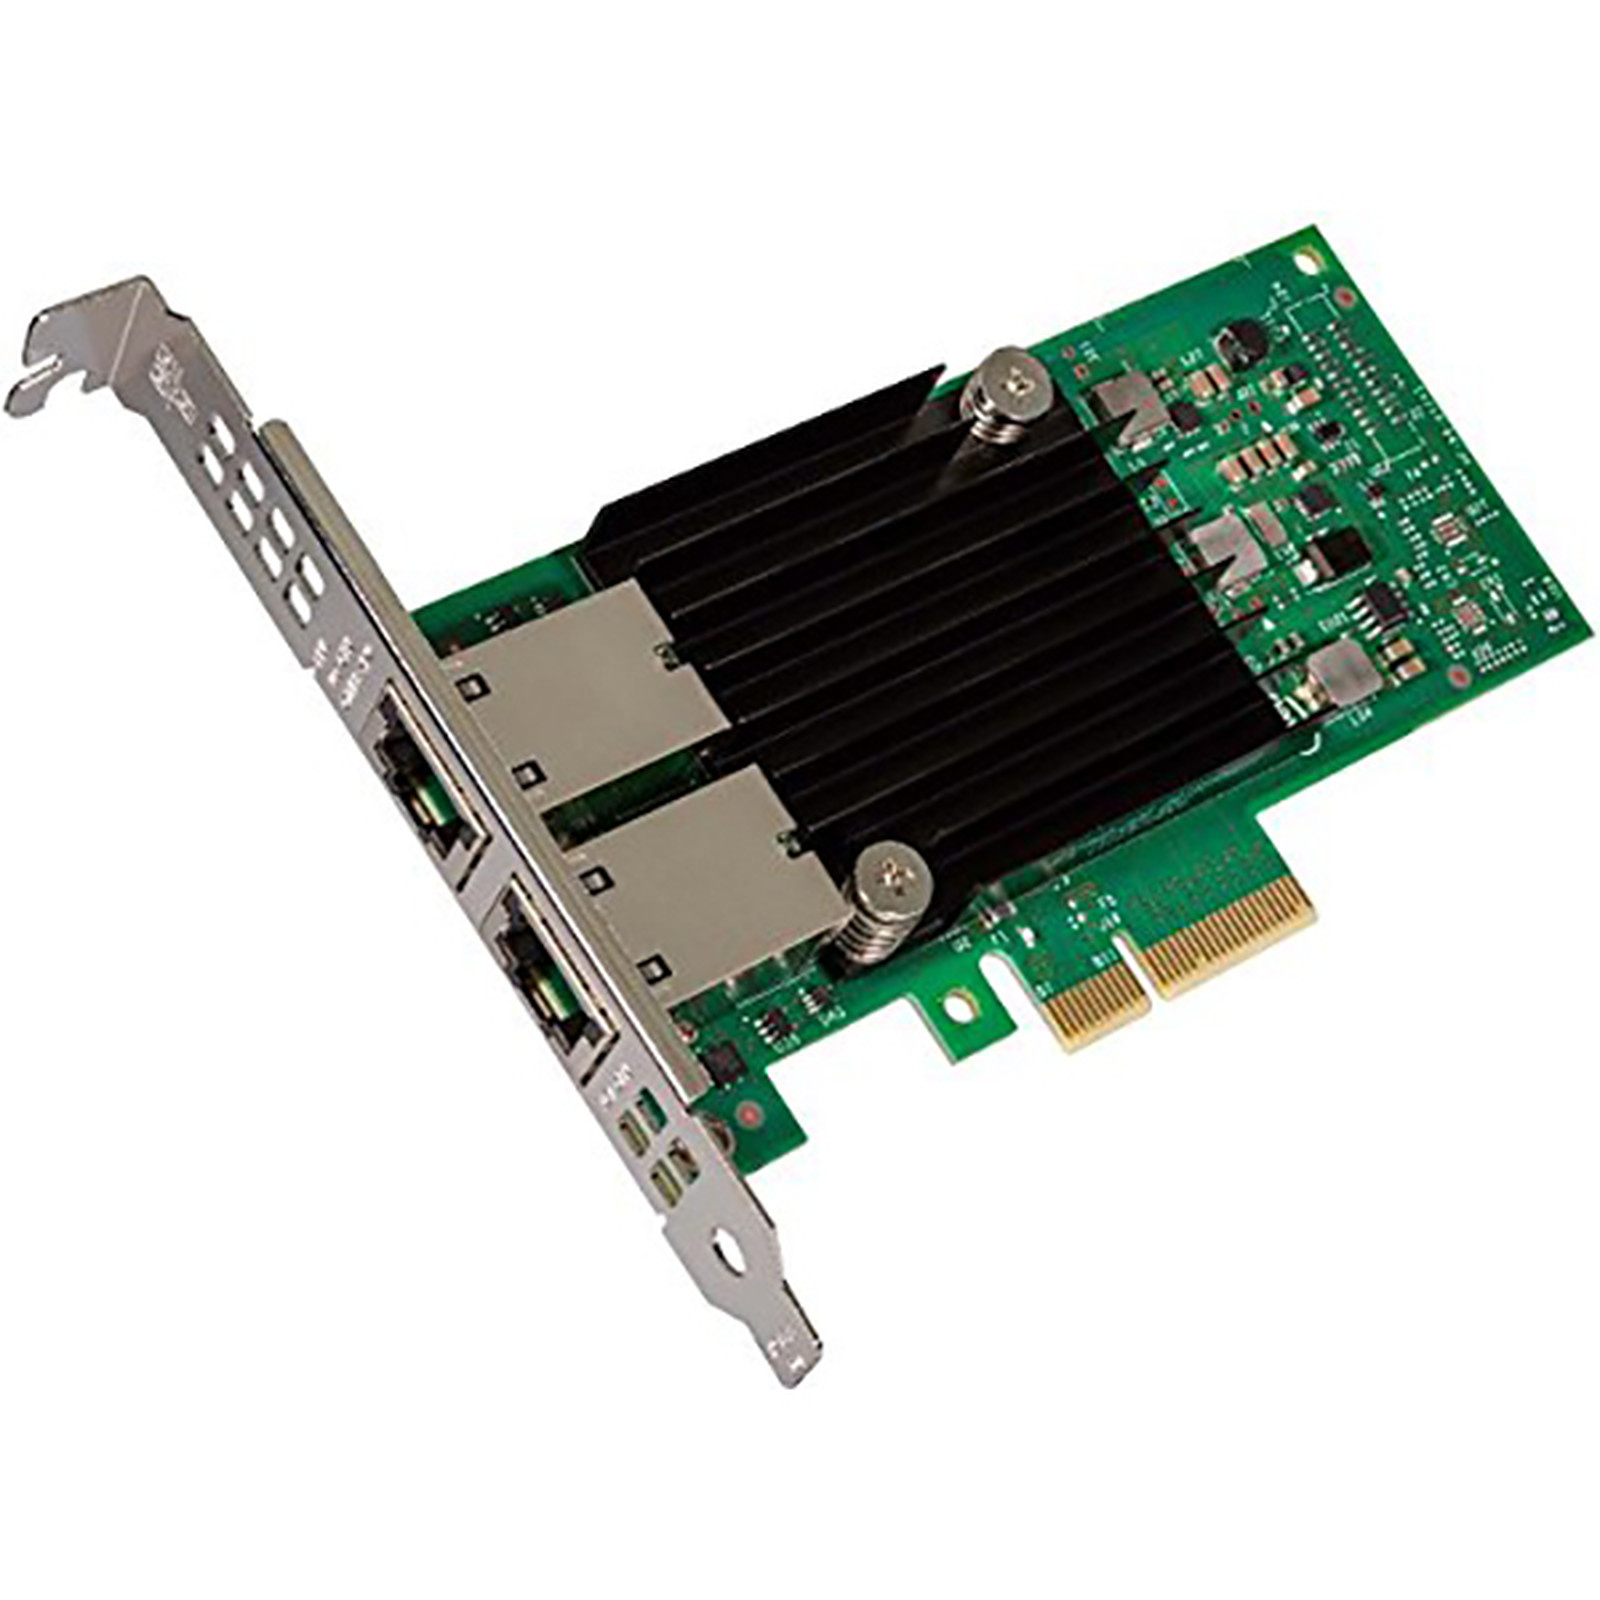 Intel Ethernet Converged Network Adapter X550-T2 (bulk)